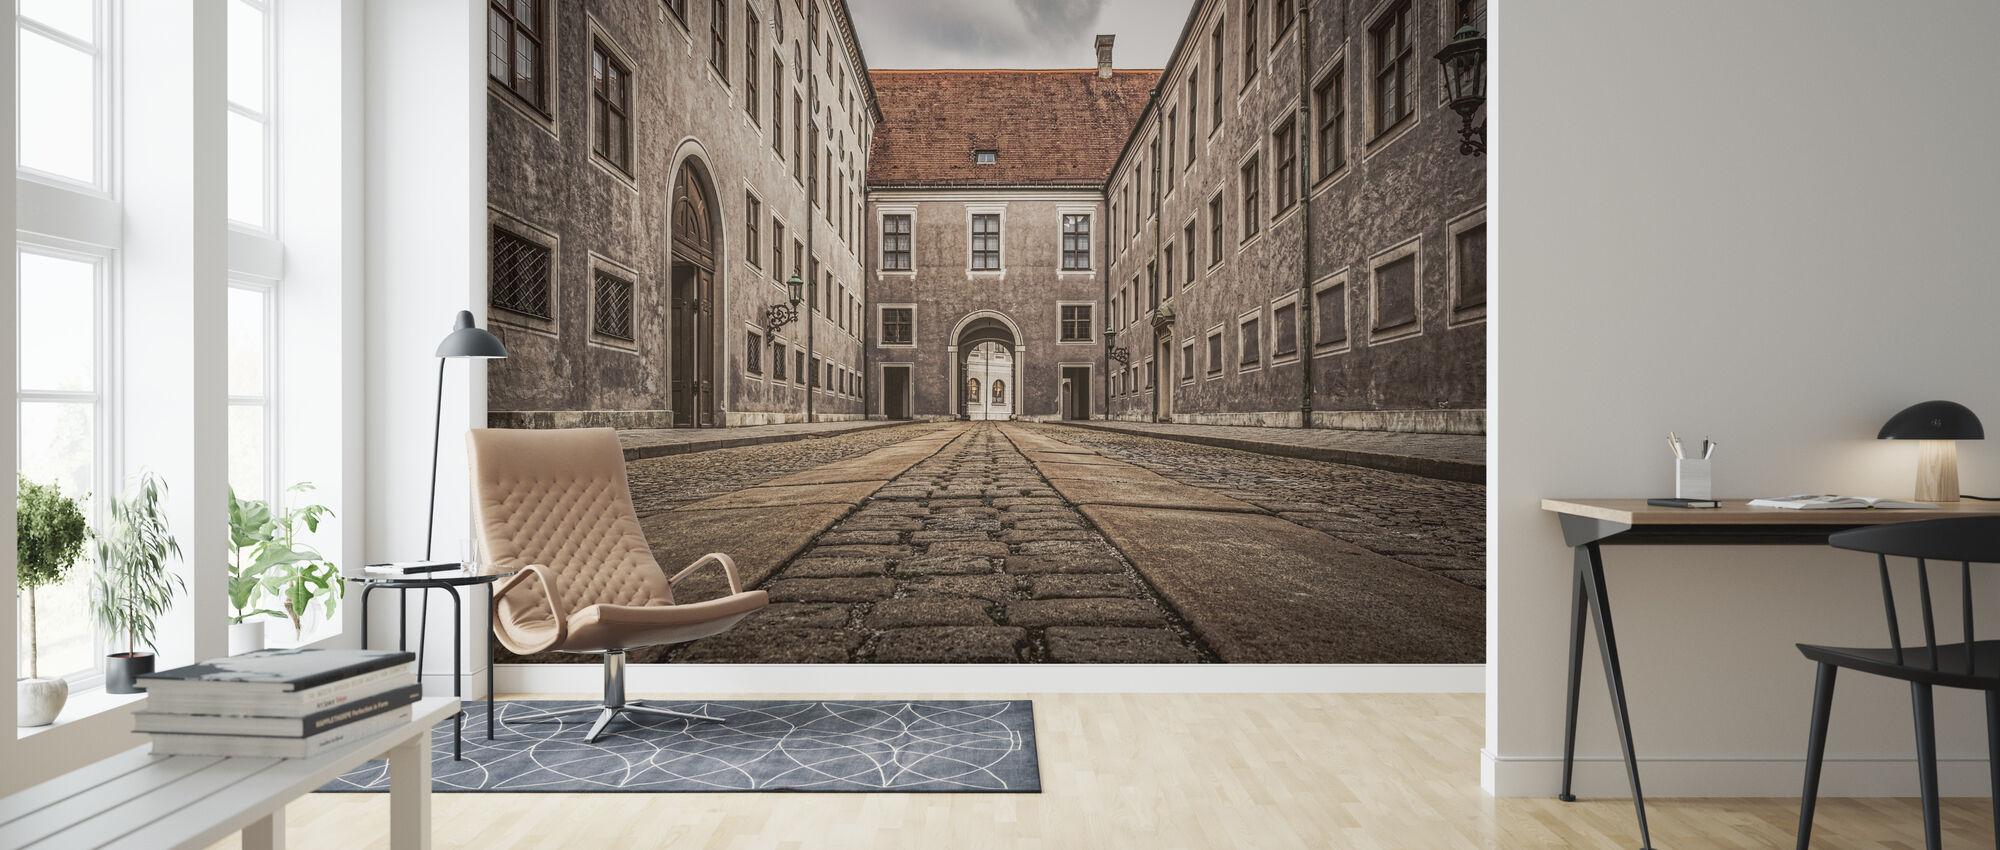 City Buildings - Wallpaper - Living Room